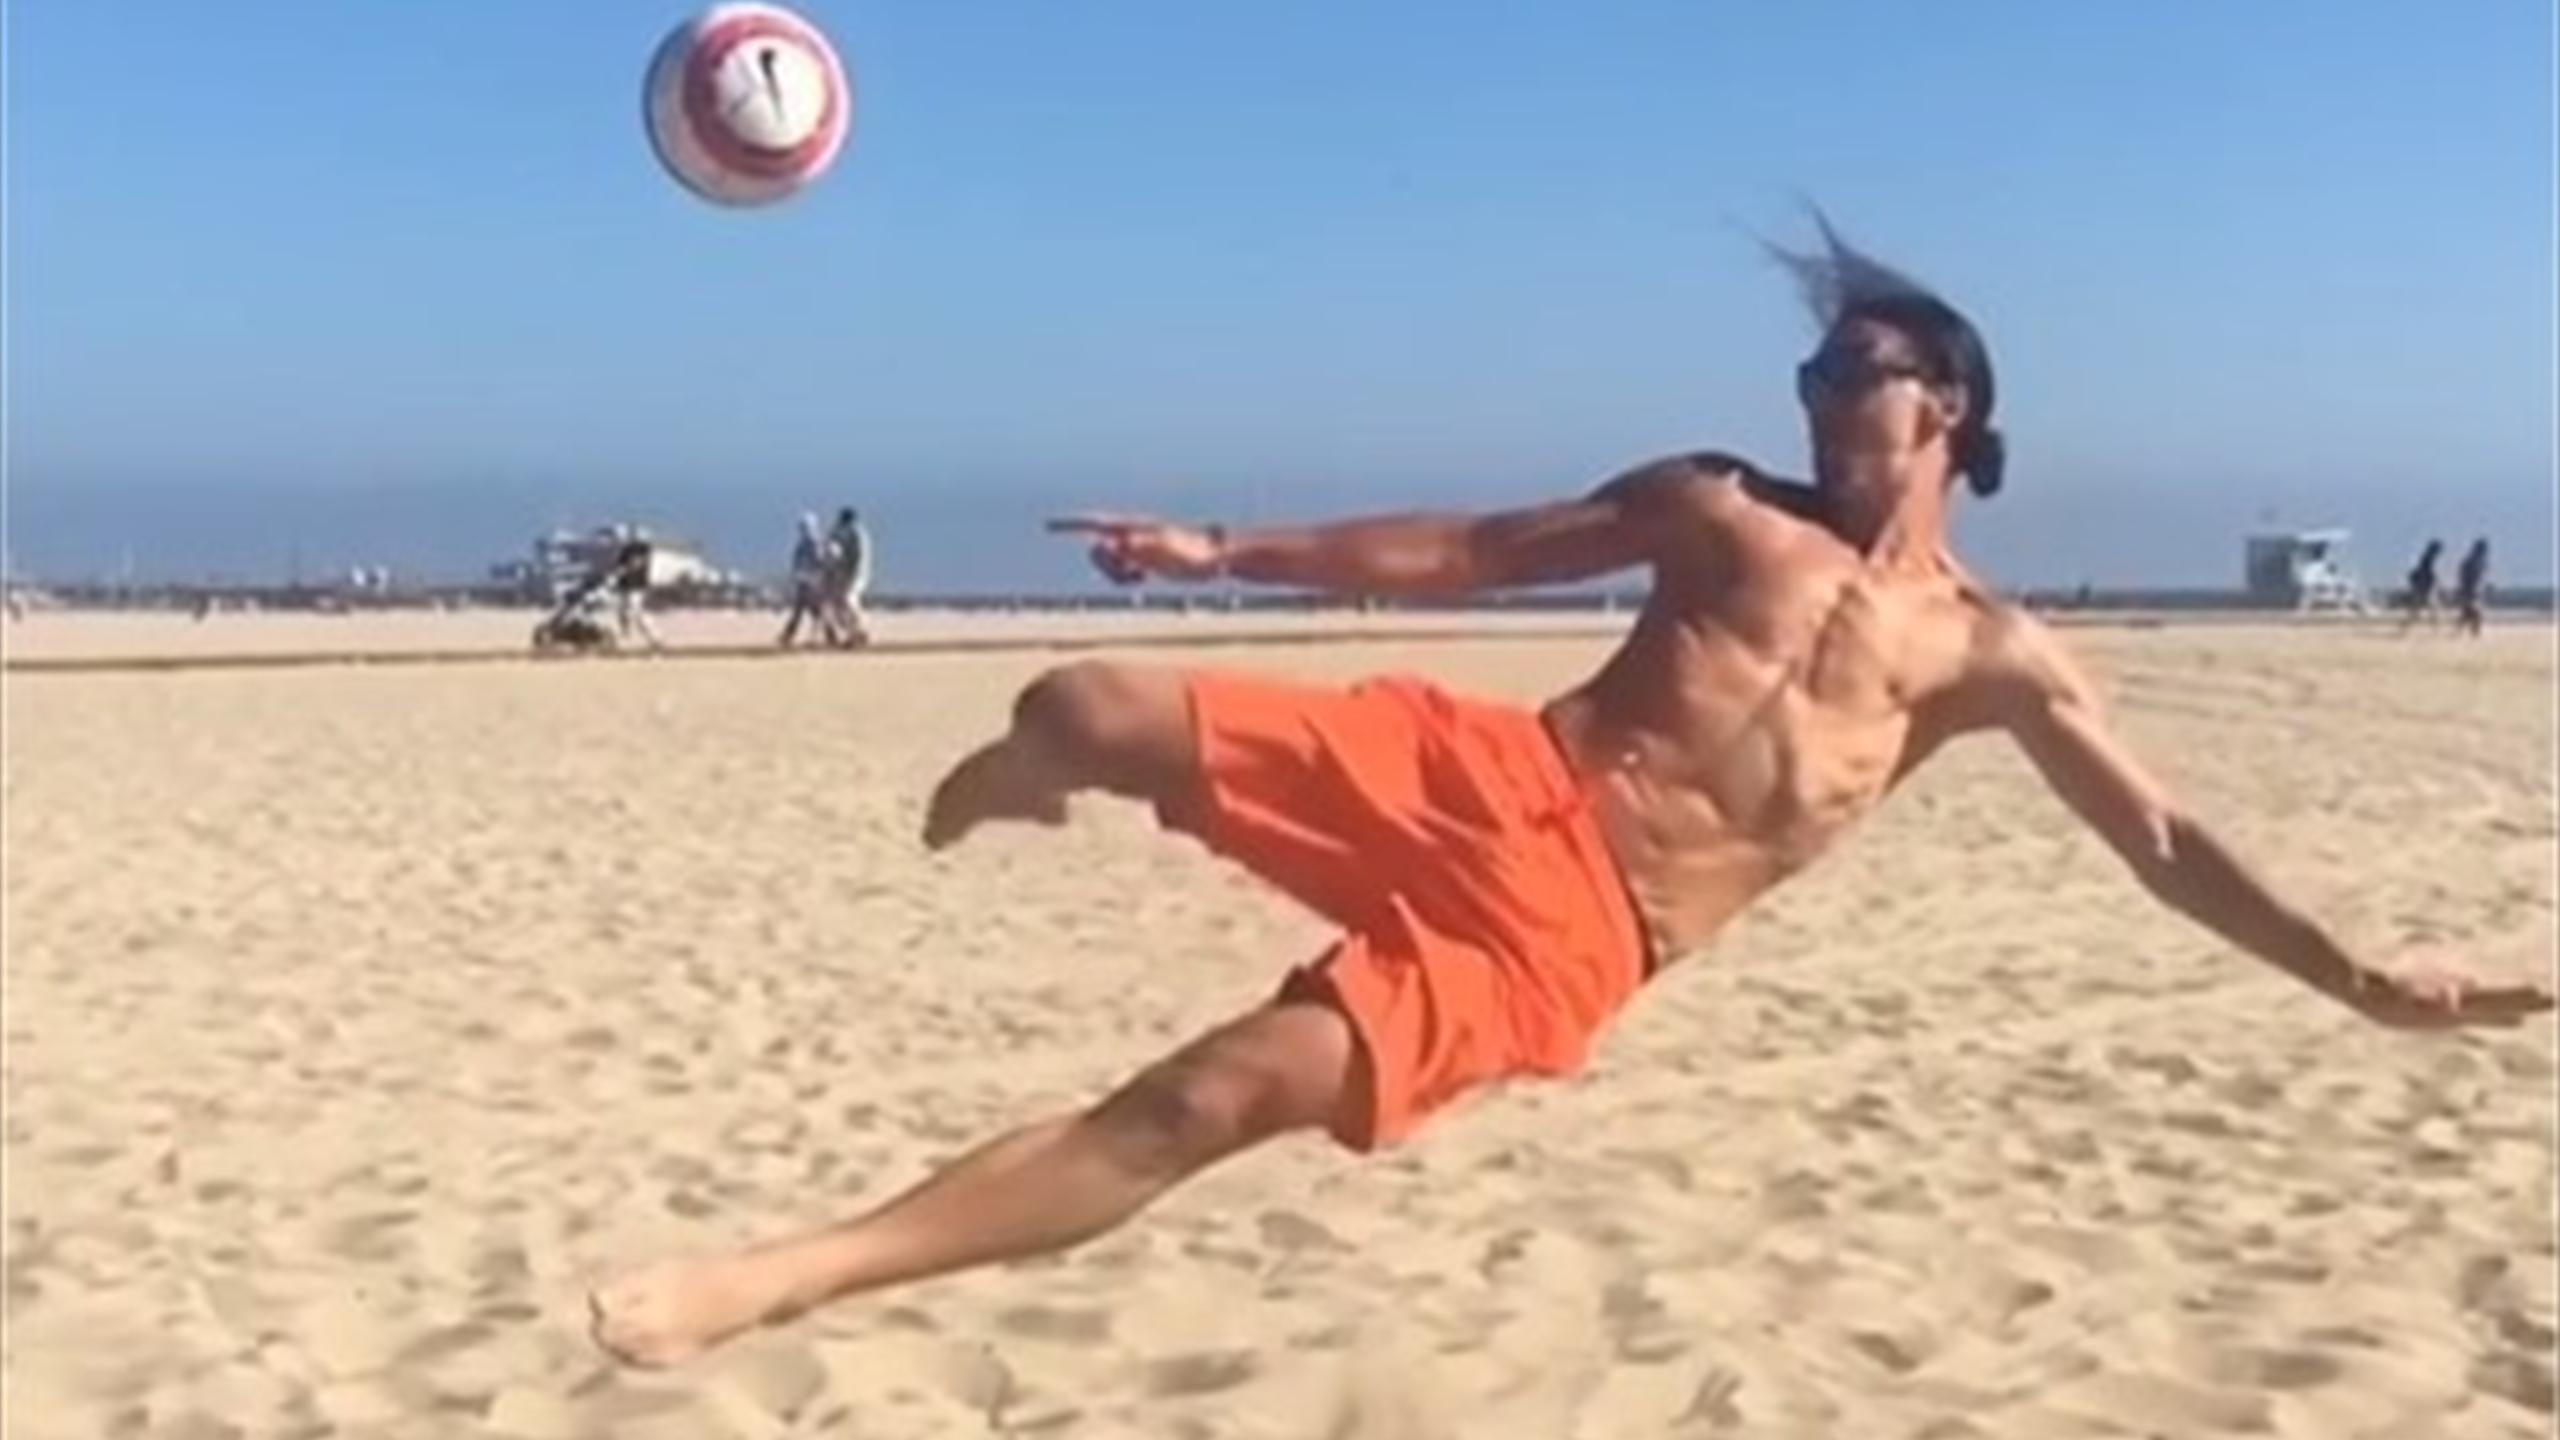 Zlatan Ibrahimovic performs stunning scissor kick on Venice Beach (Instagram)